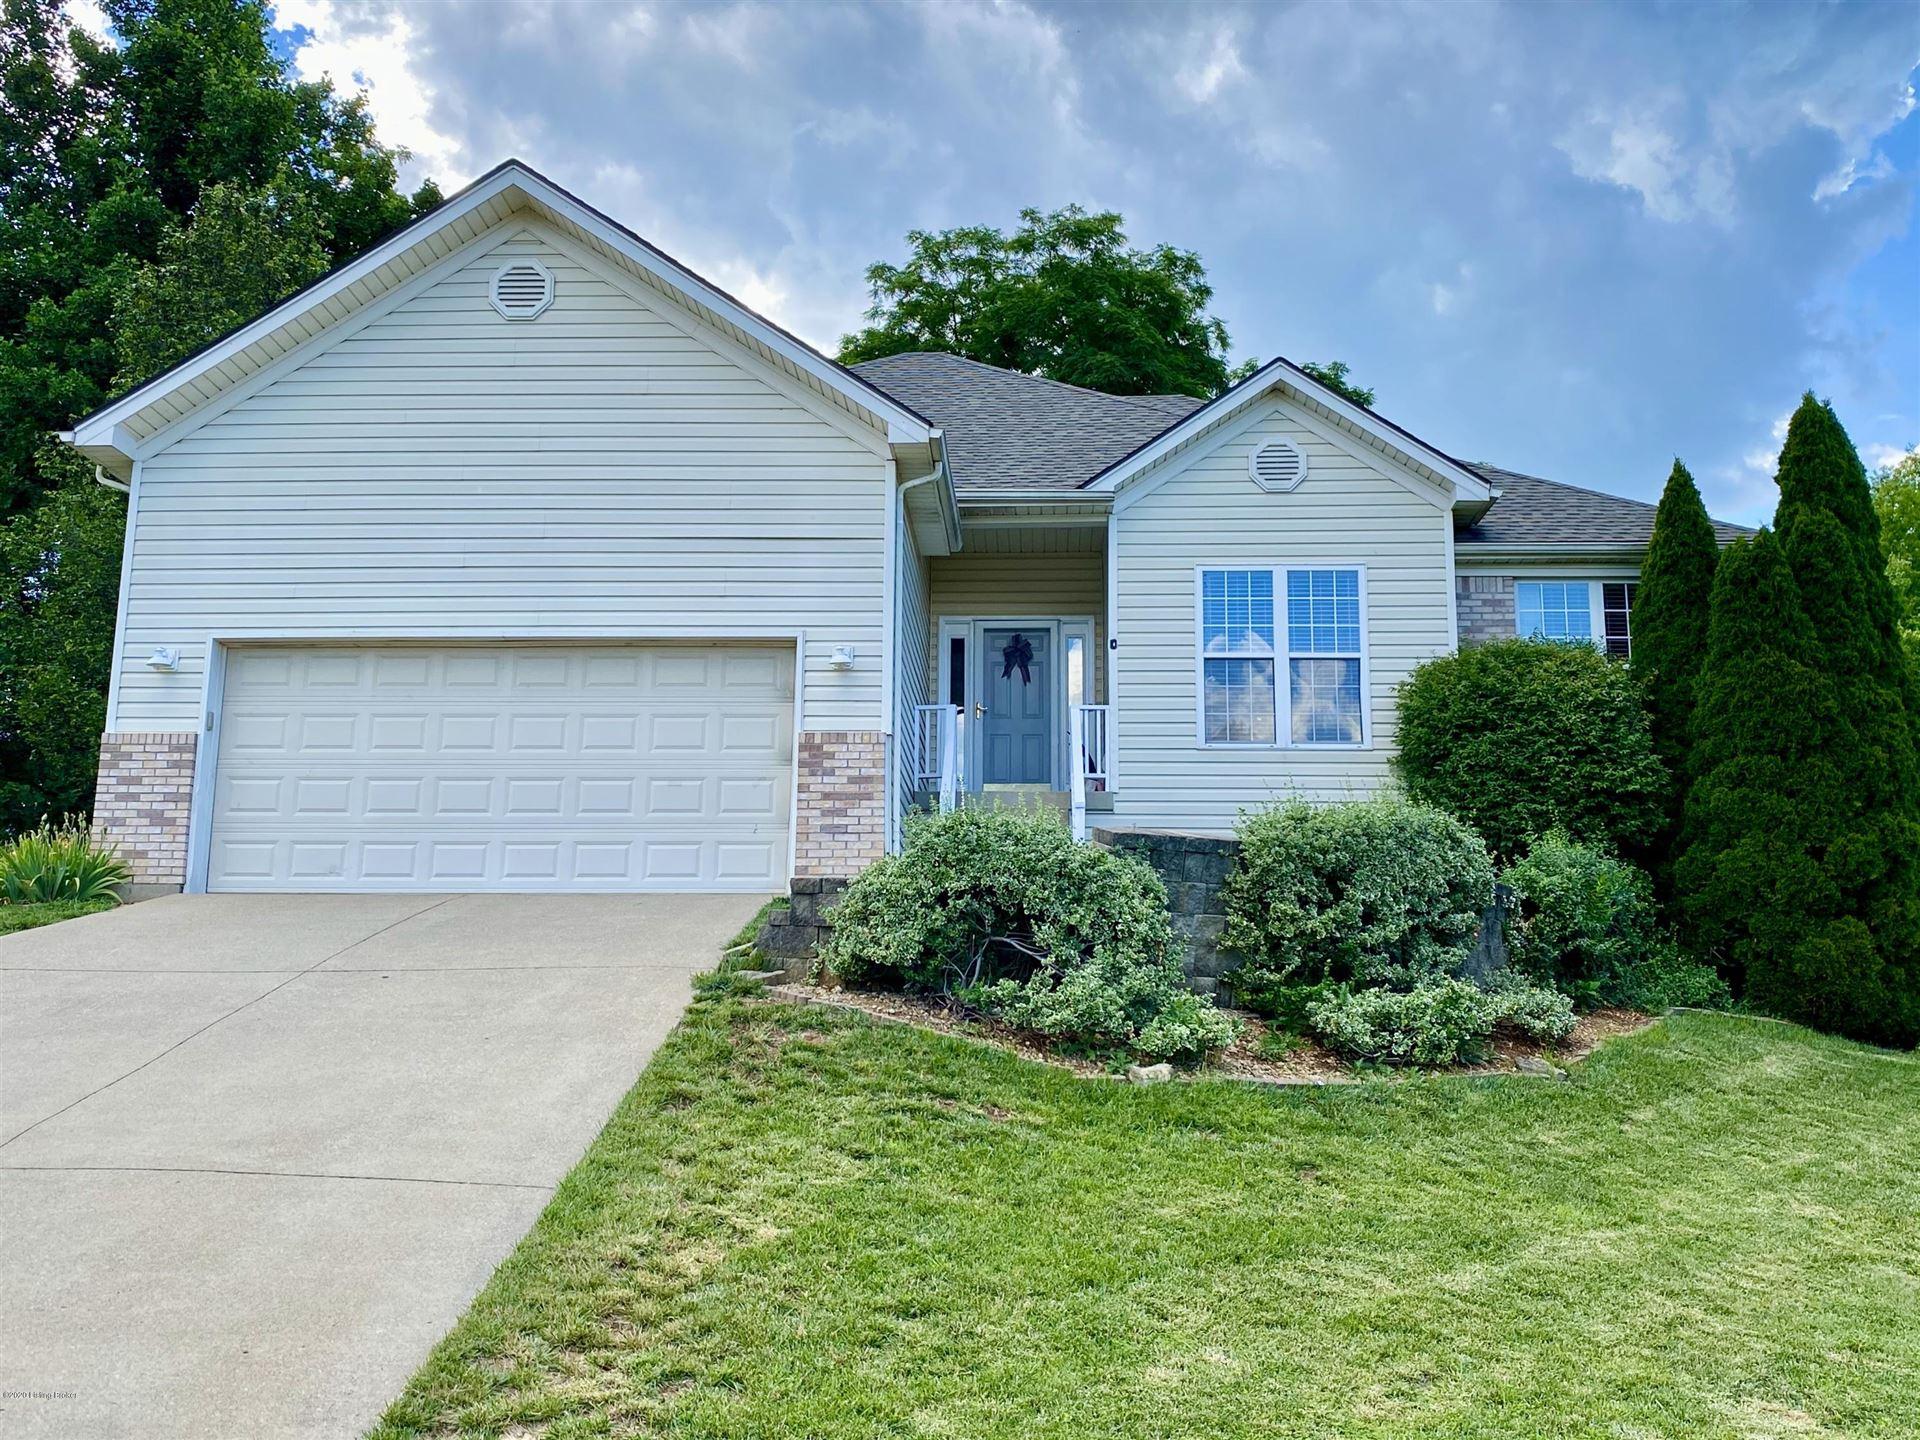 9409 Jonathan Place Pl, Crestwood, KY 40014 - #: 1562765